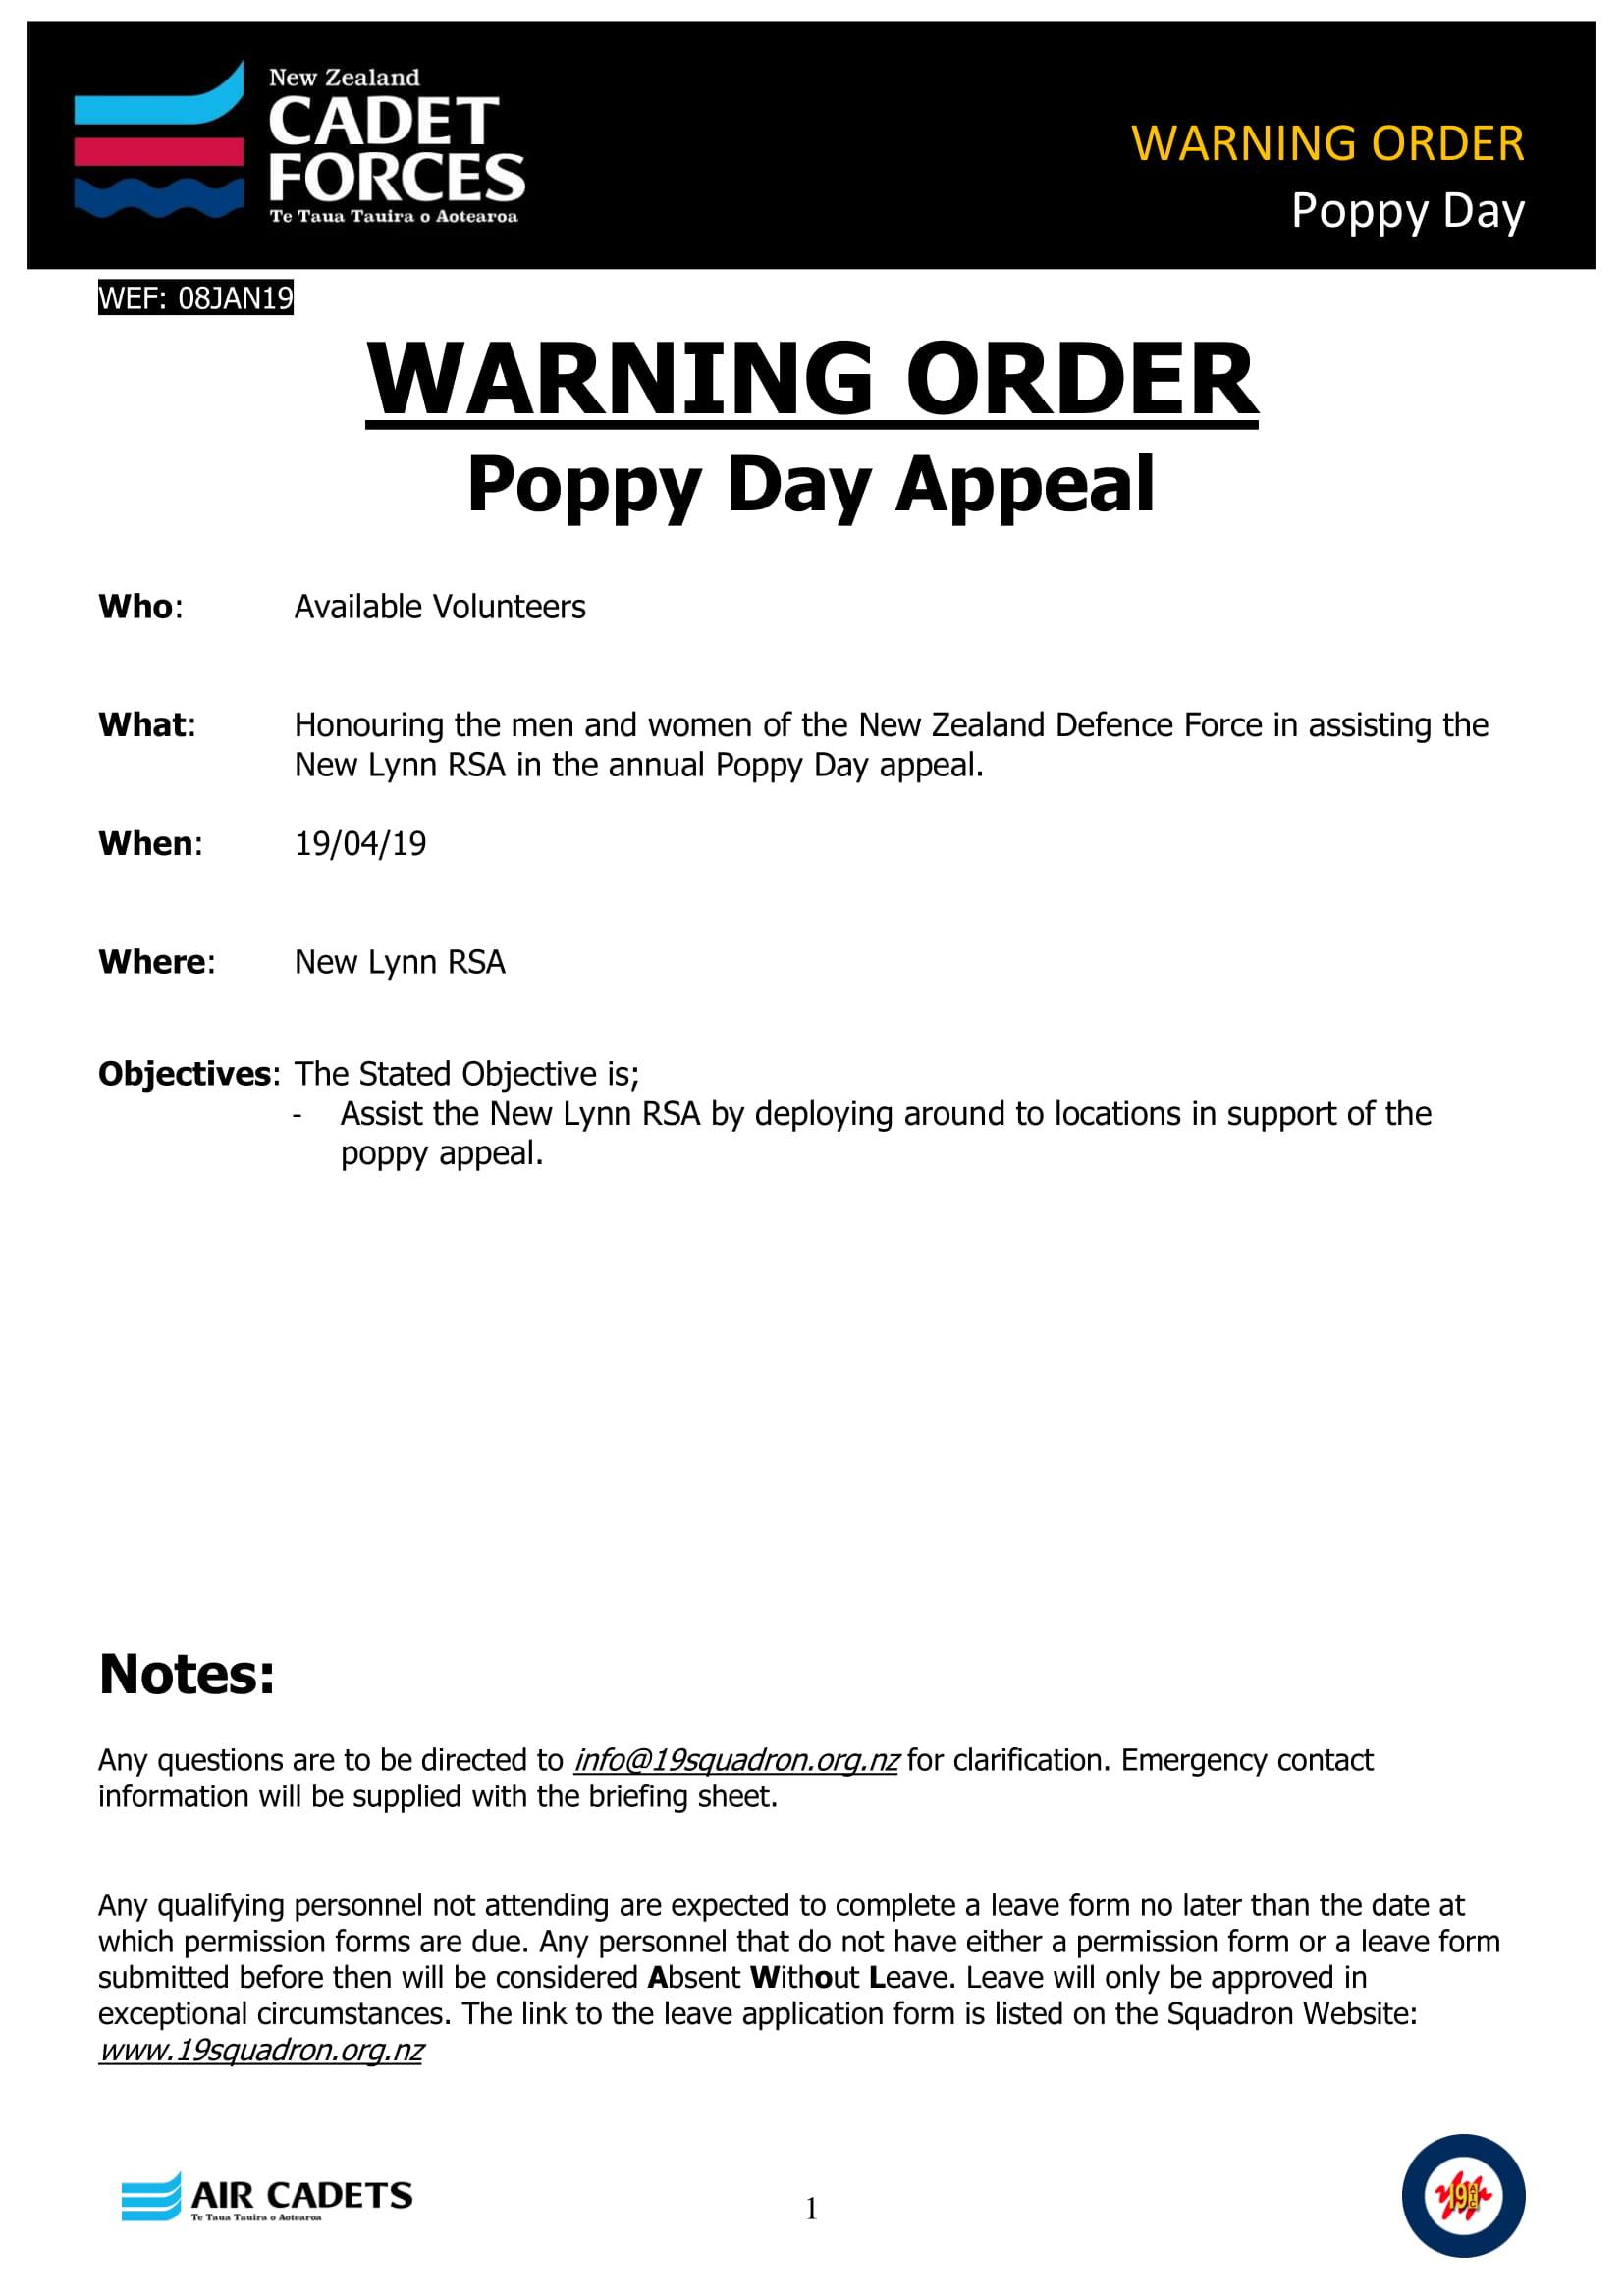 Poppy Day - Warning Order-1.jpg